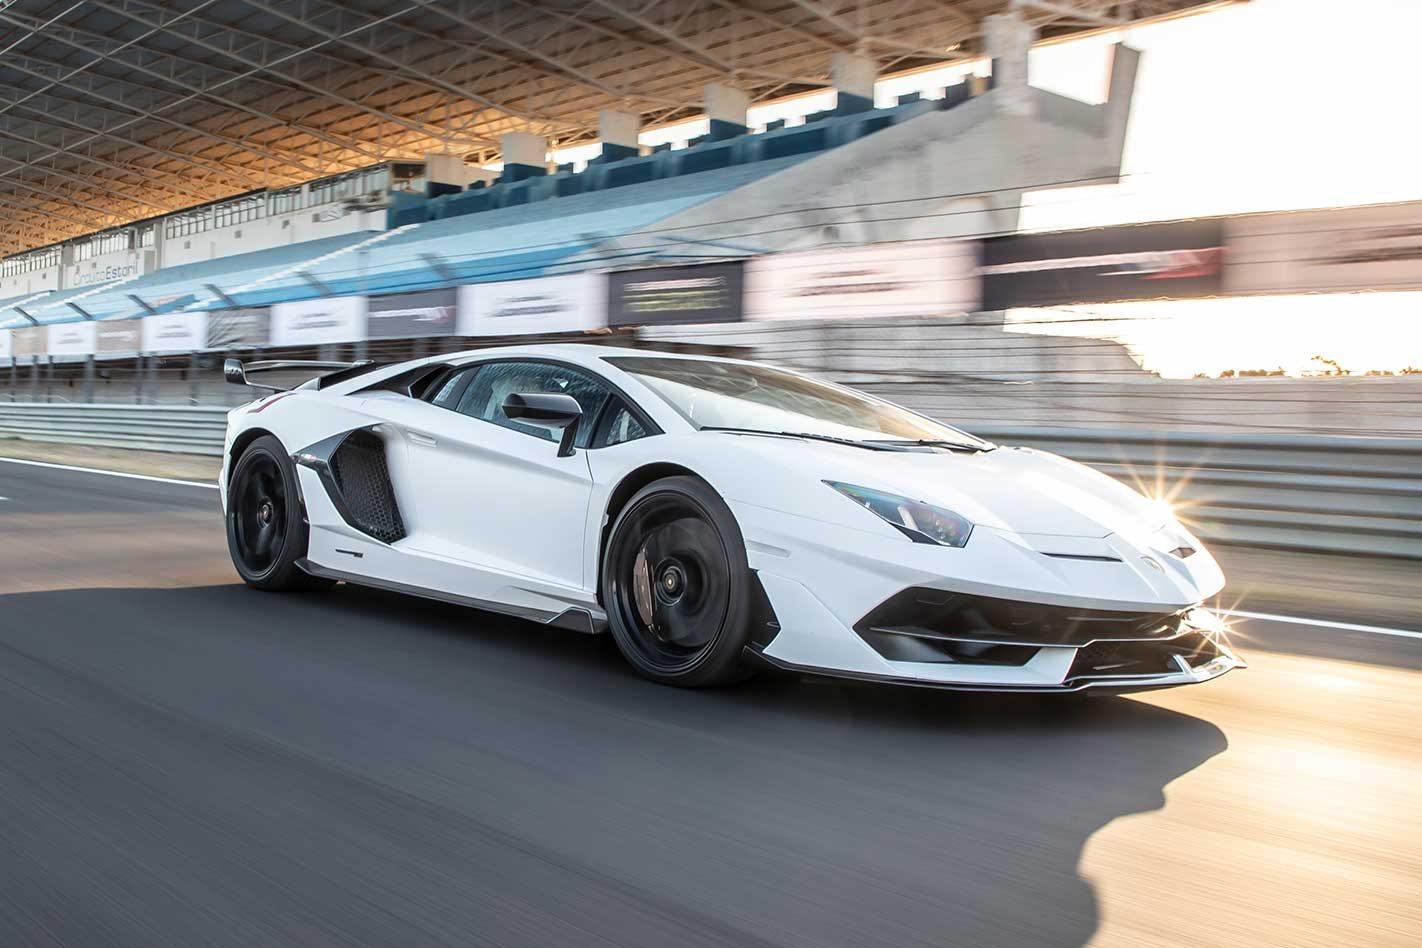 2018 Lamborghini Aventador Svj Performance Review Motor Magazine